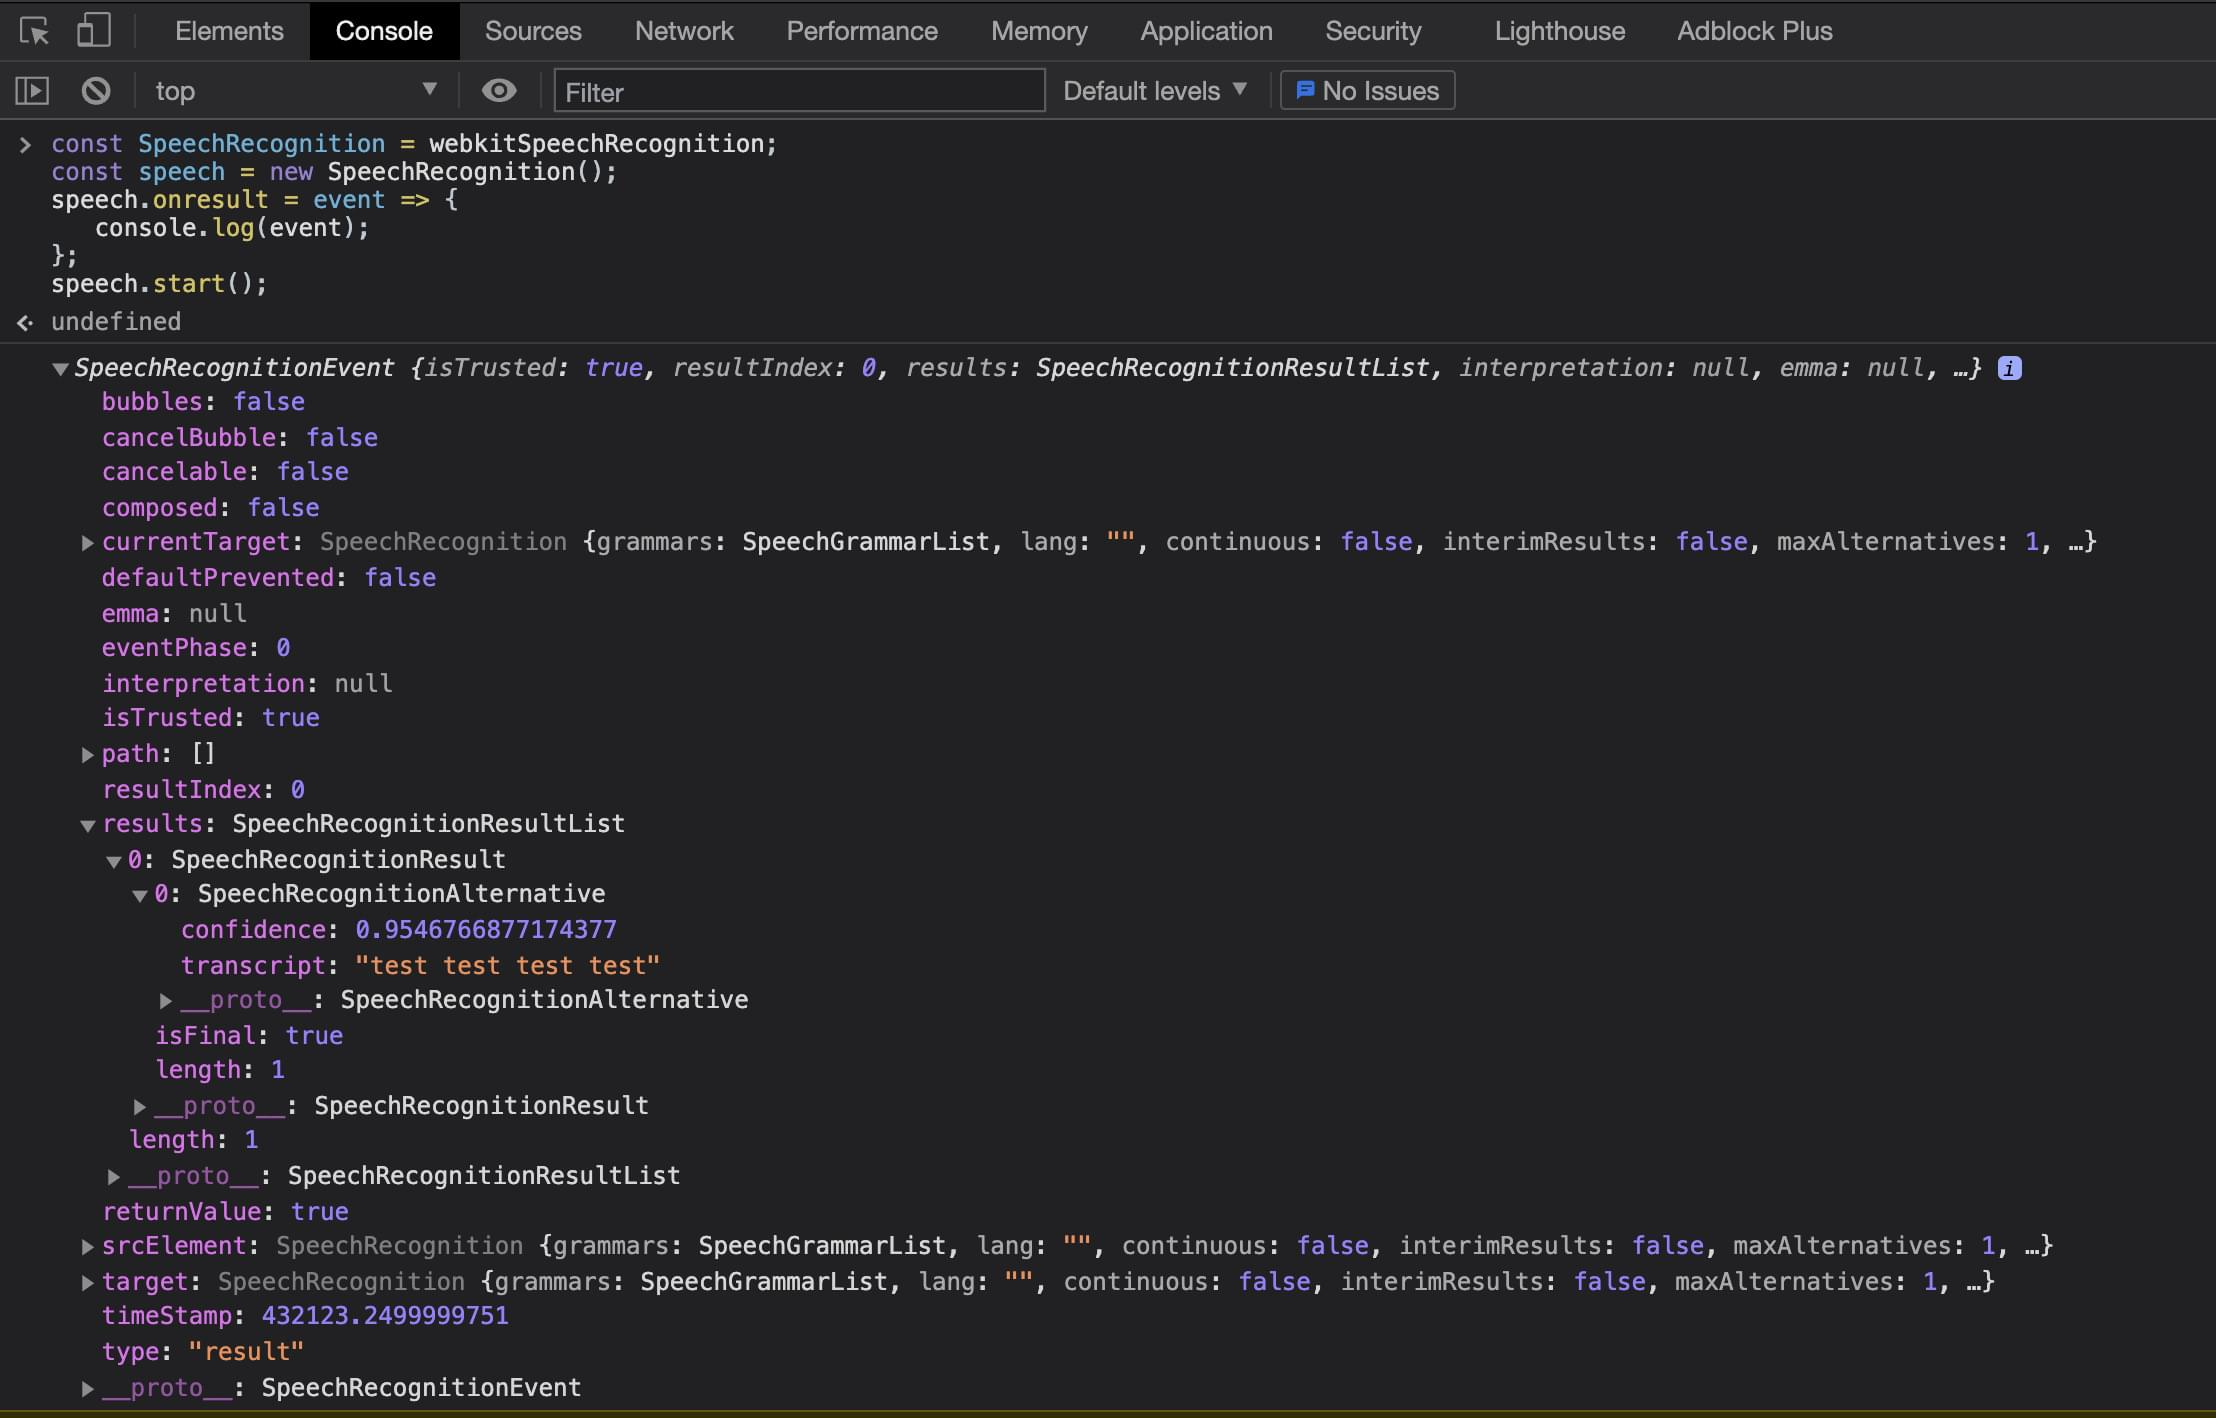 Browser devtools showing SpeechRecognitionResultList